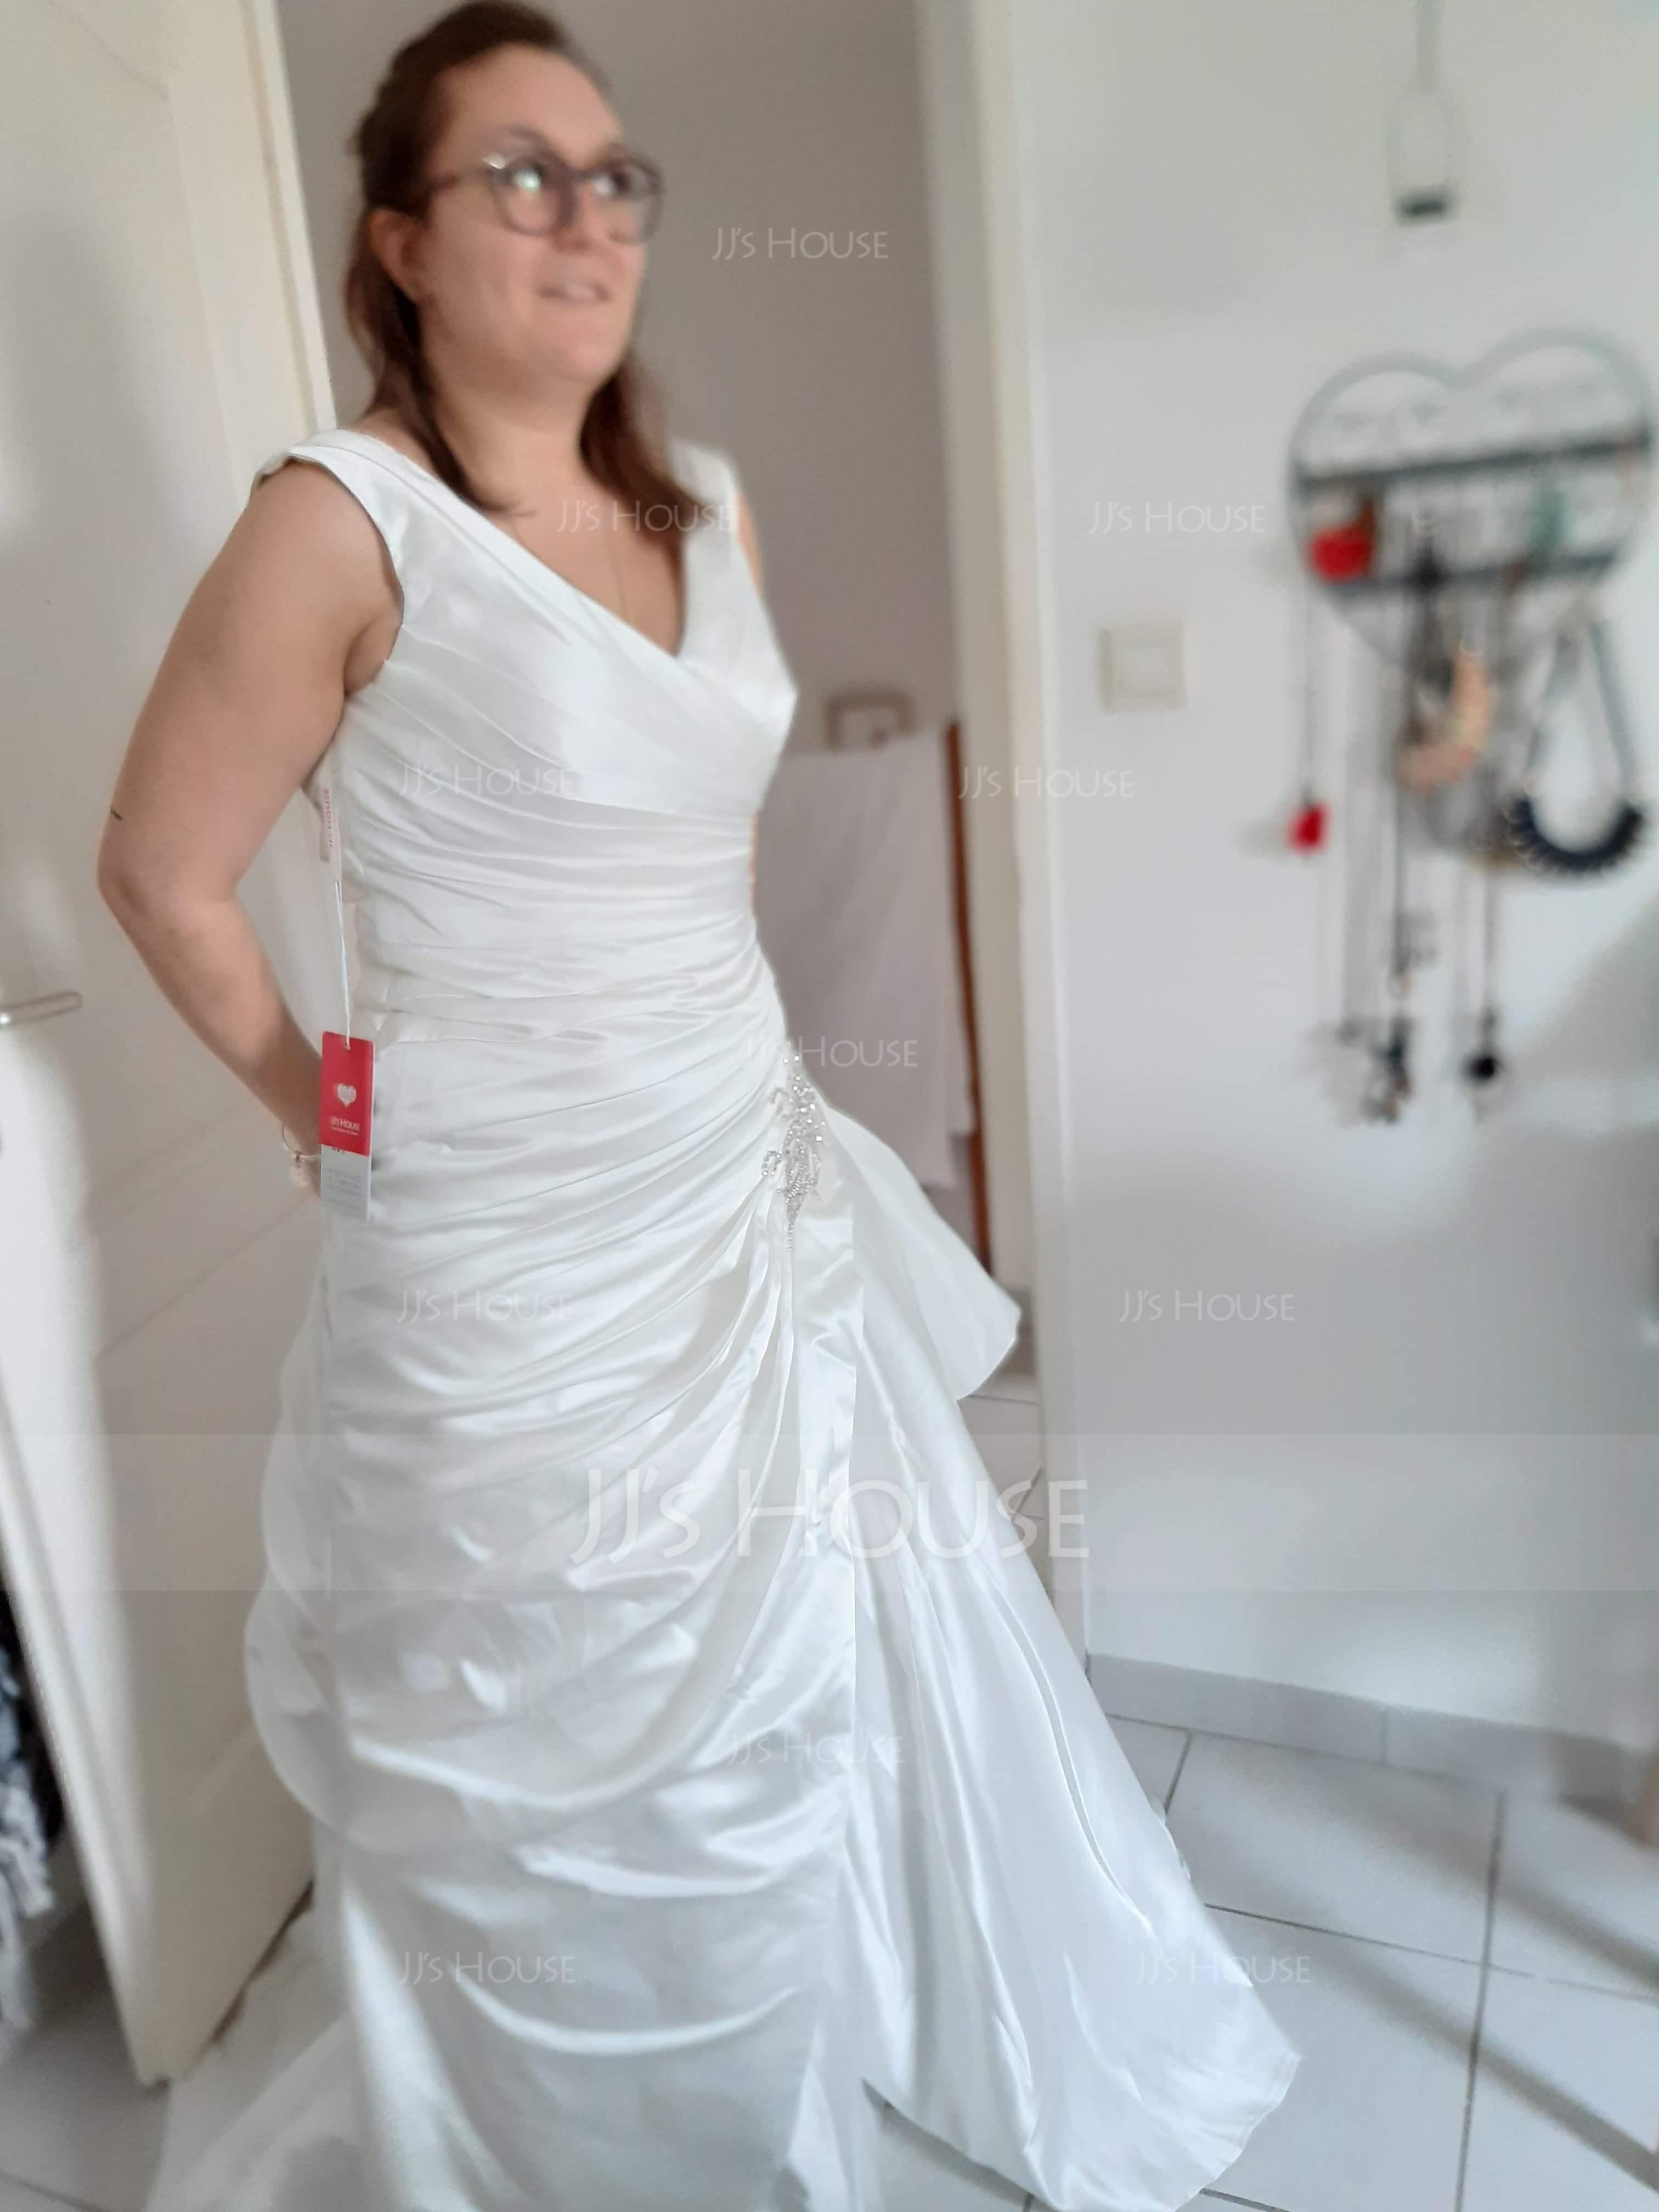 Forme Princesse Col V Traîne moyenne Satiné Robe de mariée avec Brodé (002127256)